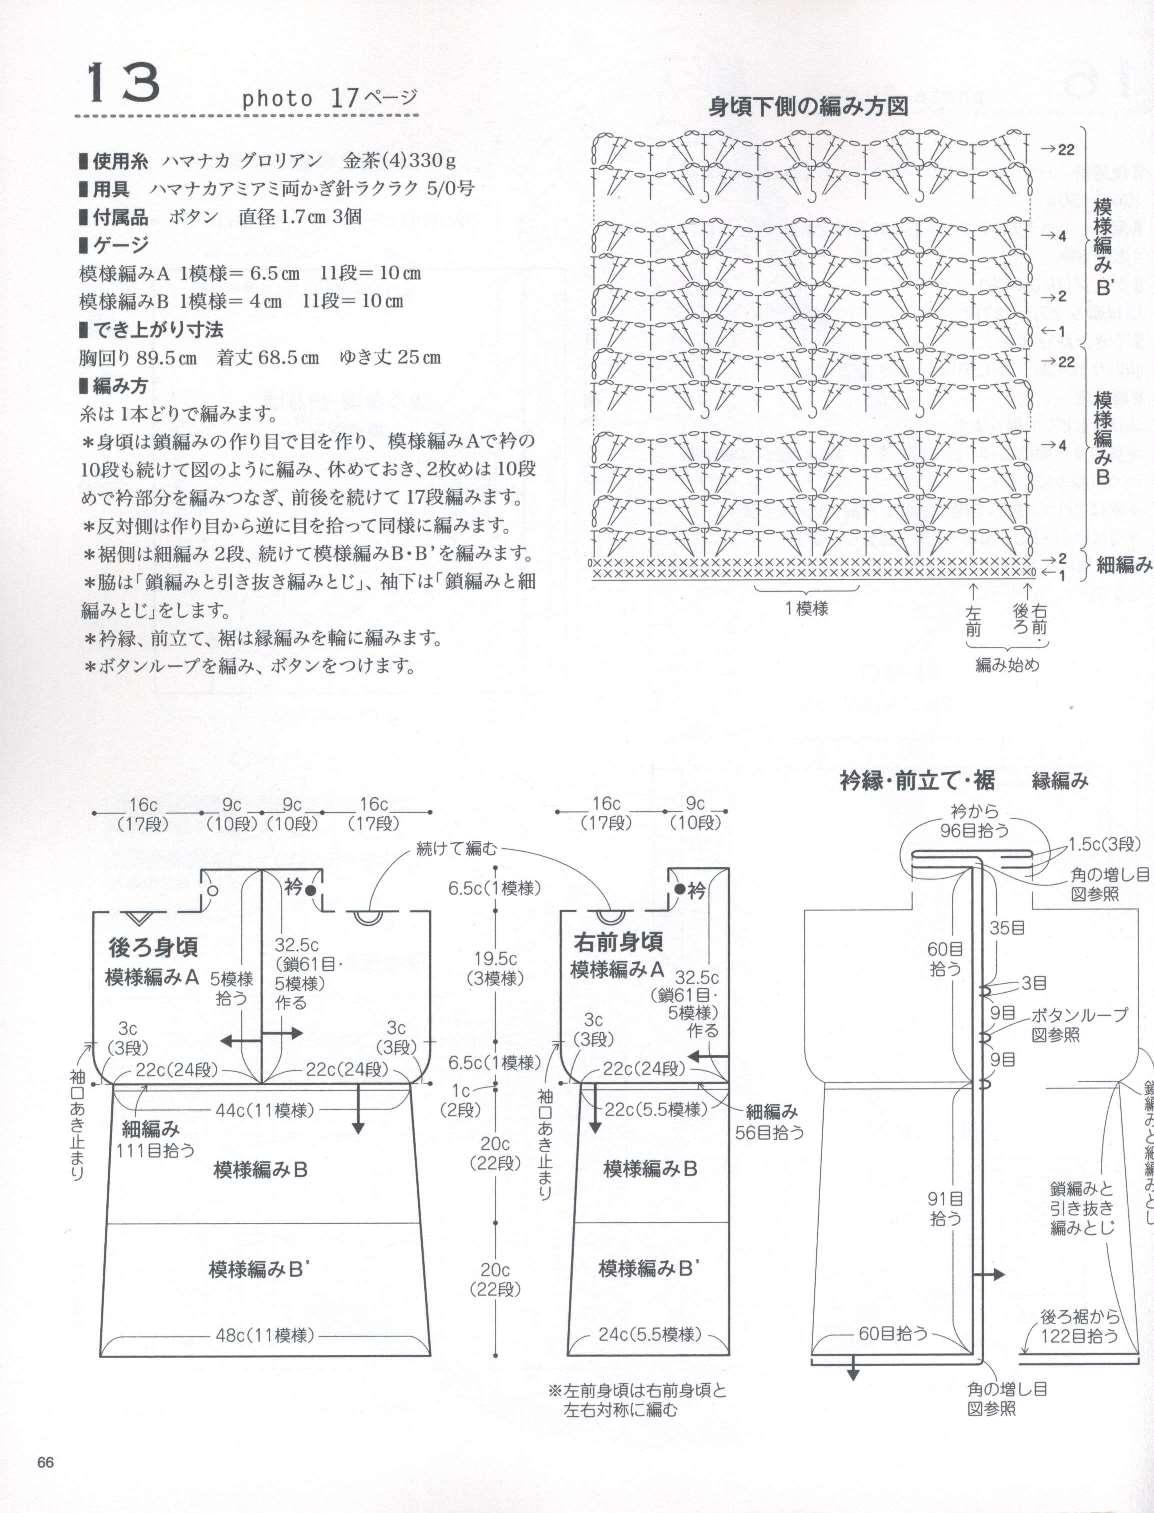 0935_Woman's Handknit №3606_13_13 (2)